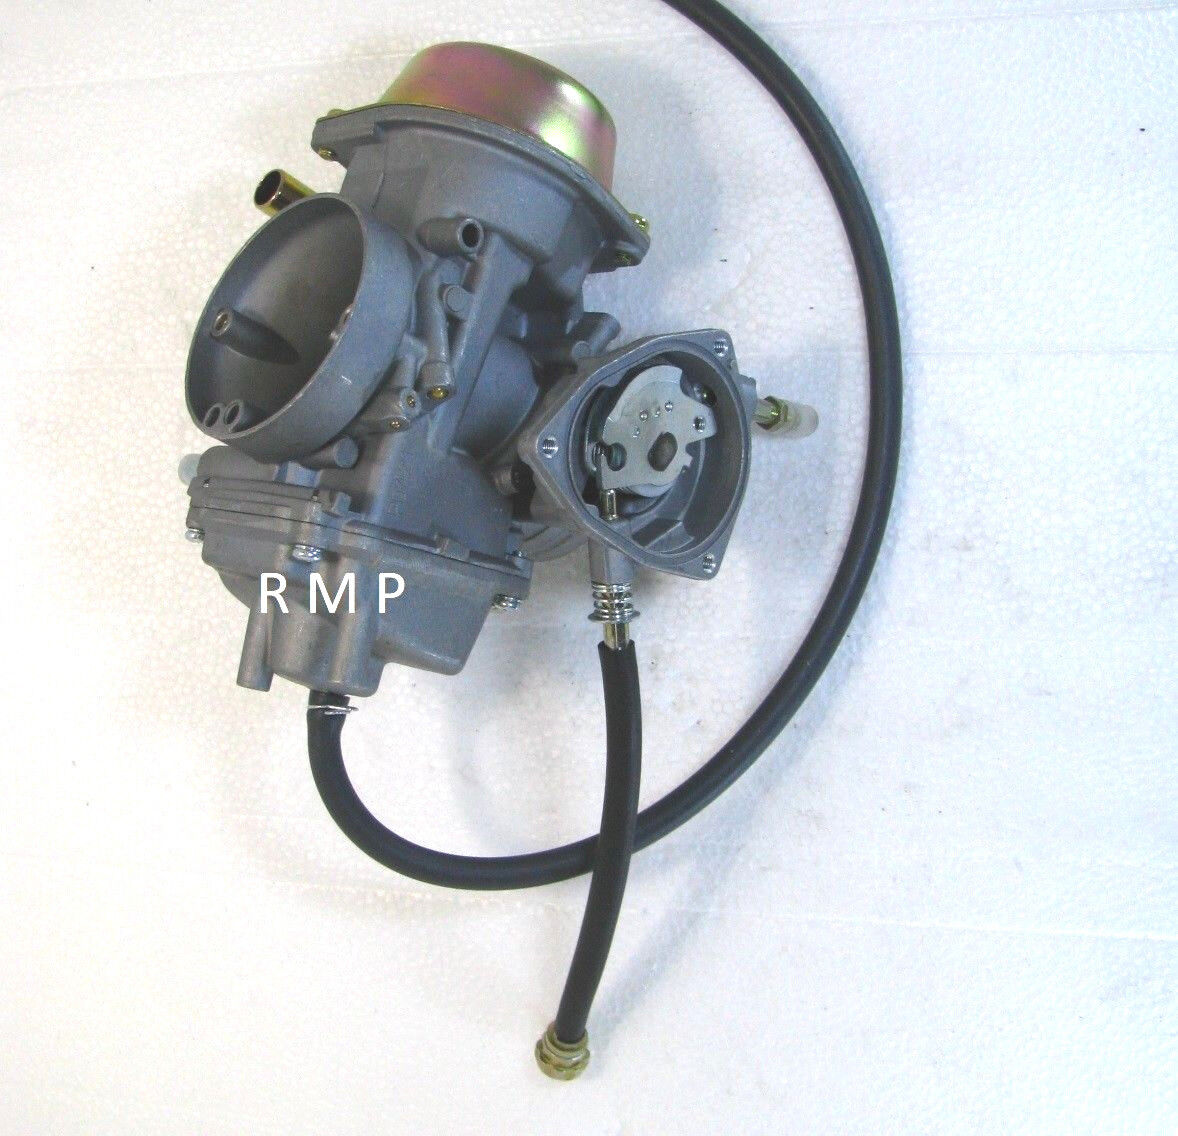 Carburetor FITS POLARIS ProssoATOR 500 20032006 NEW Carb